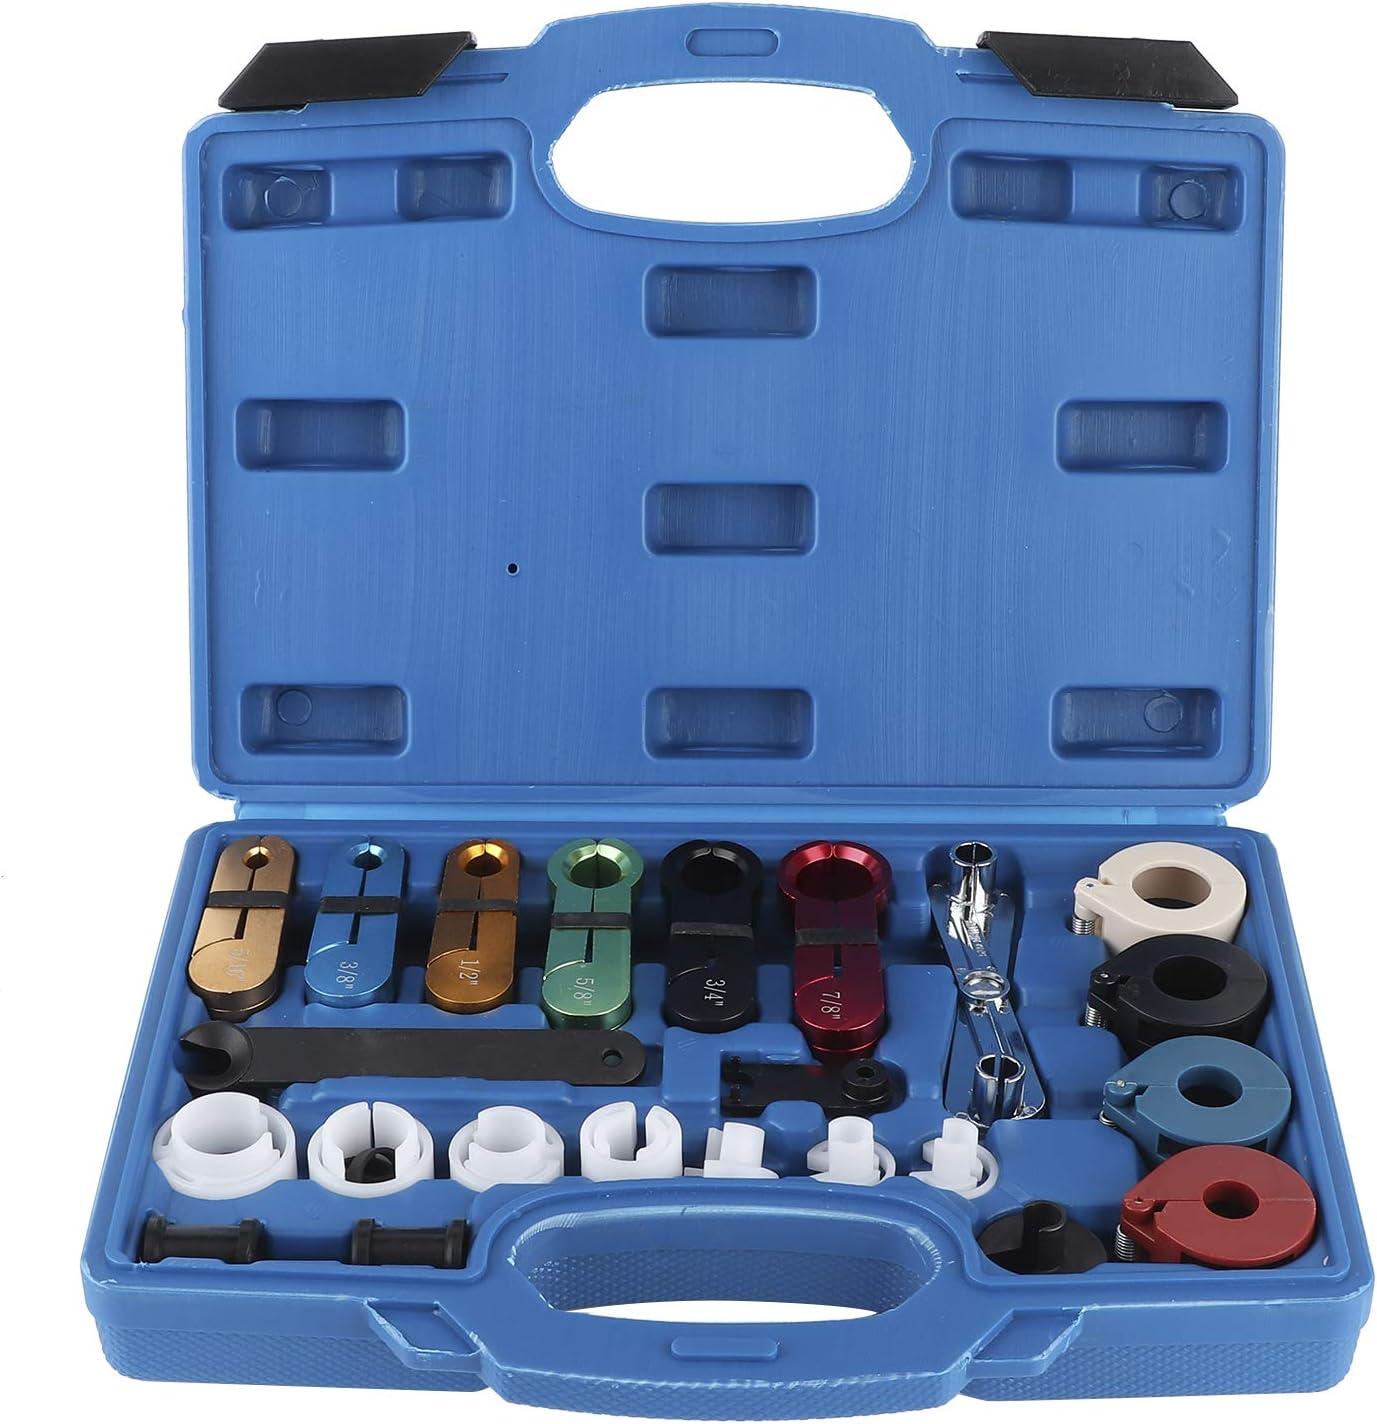 Quick Disconnect Tool Kit, 22Pcs/Set Fuel Line Disconnect Tool A